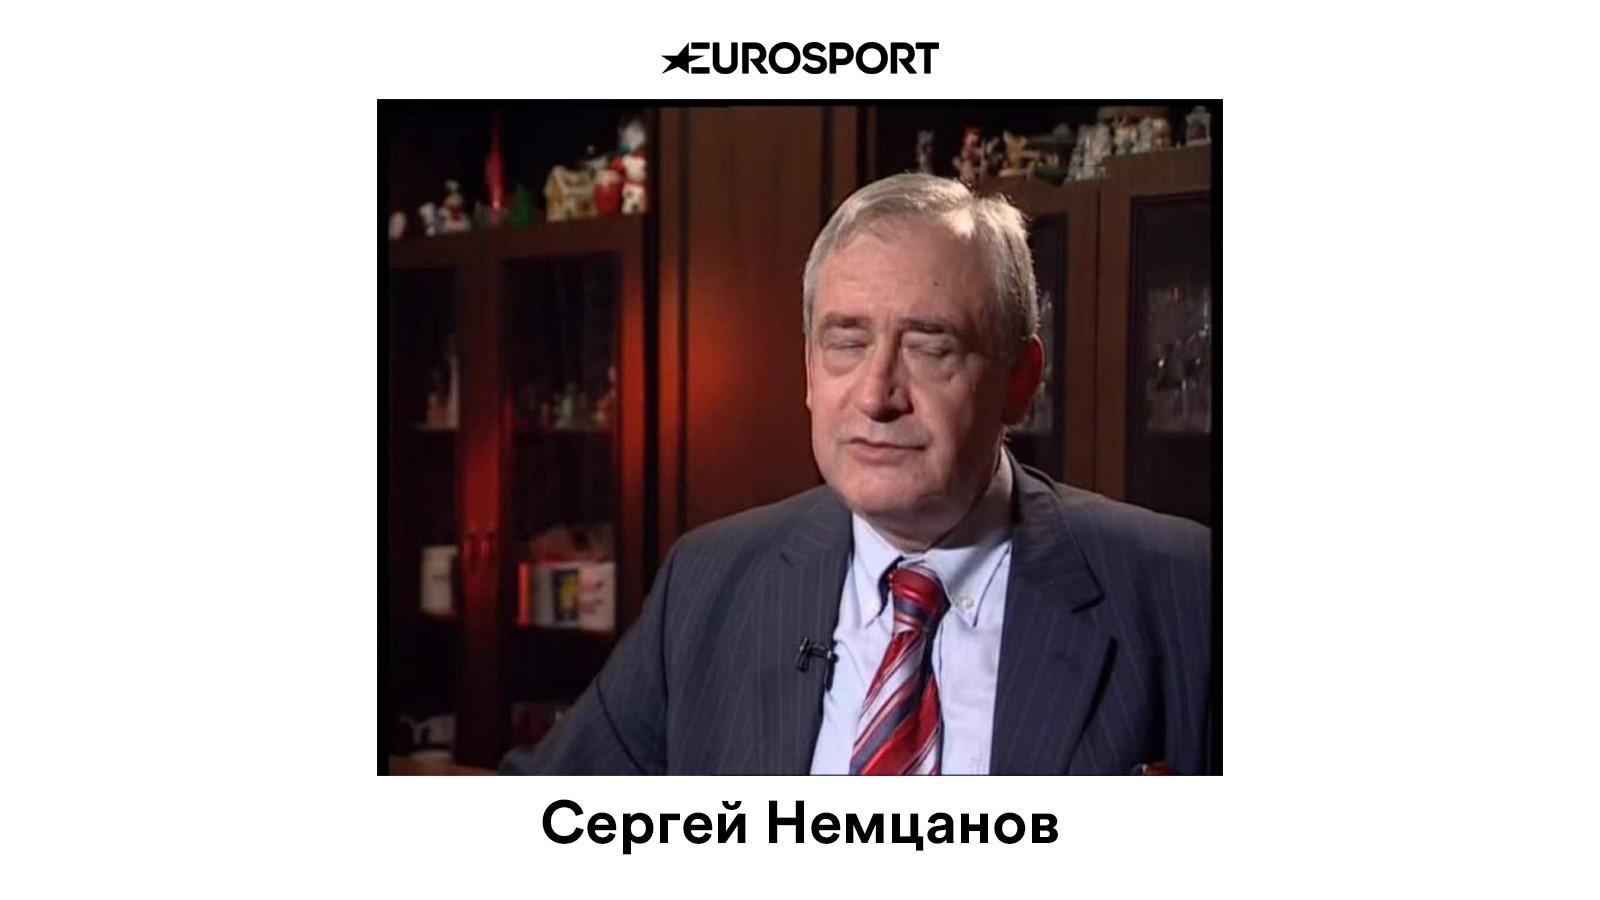 https://i.eurosport.com/2019/06/23/2624456.jpg